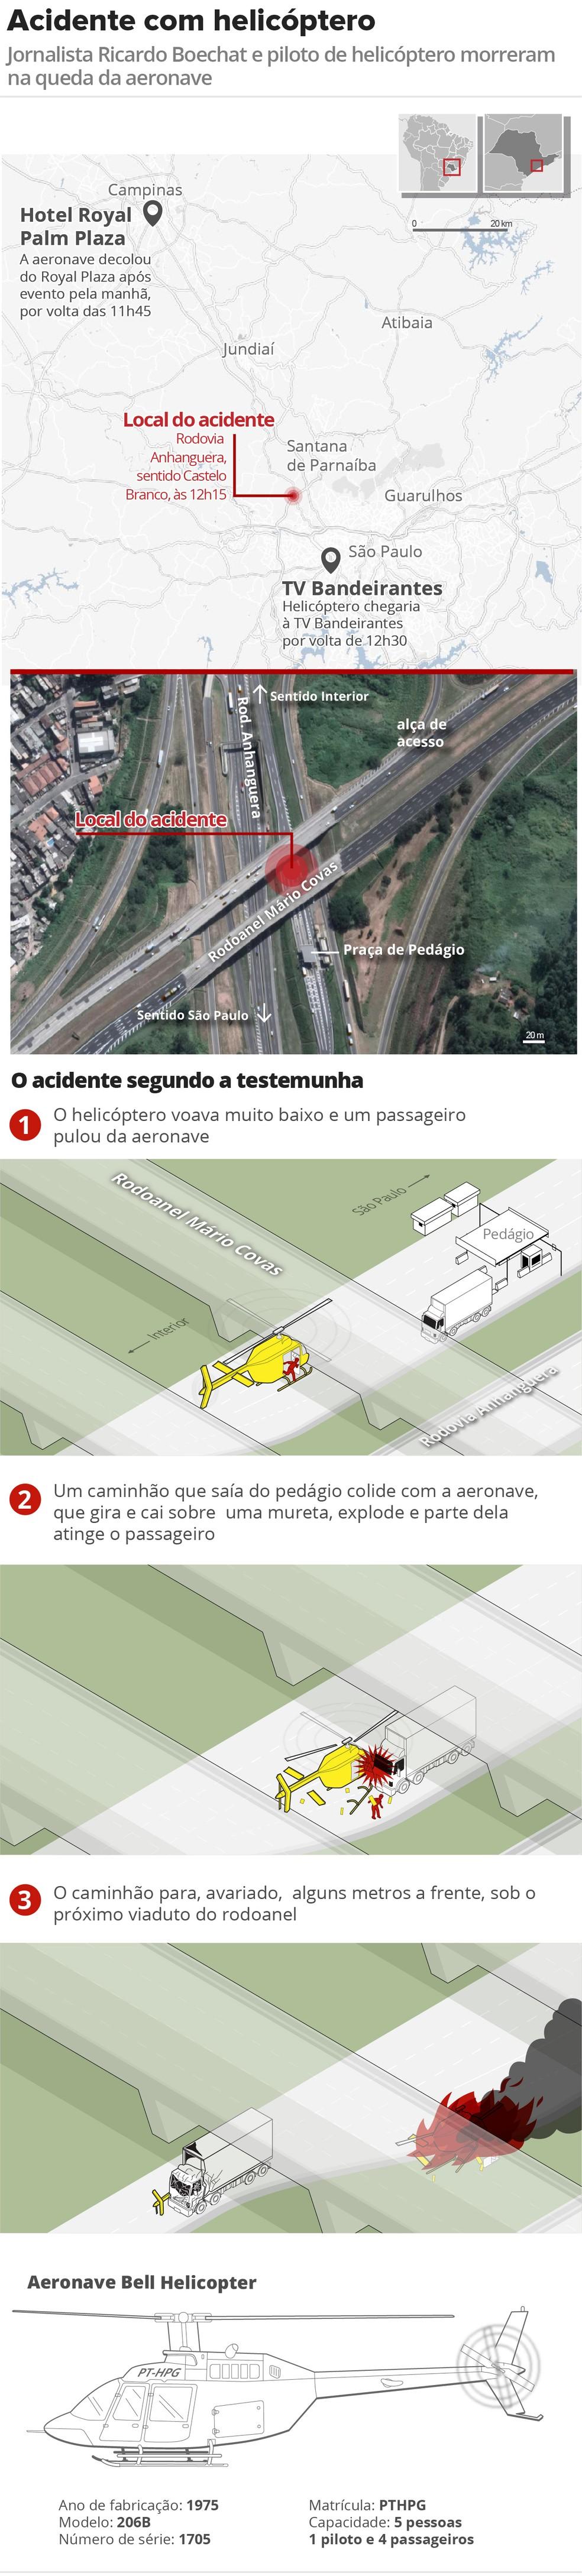 Veja como foi o acidente com o helicóptero que matou Boechat, segundo testemunha — Foto: Alexandre Mauro/Editoria de Arte/G1